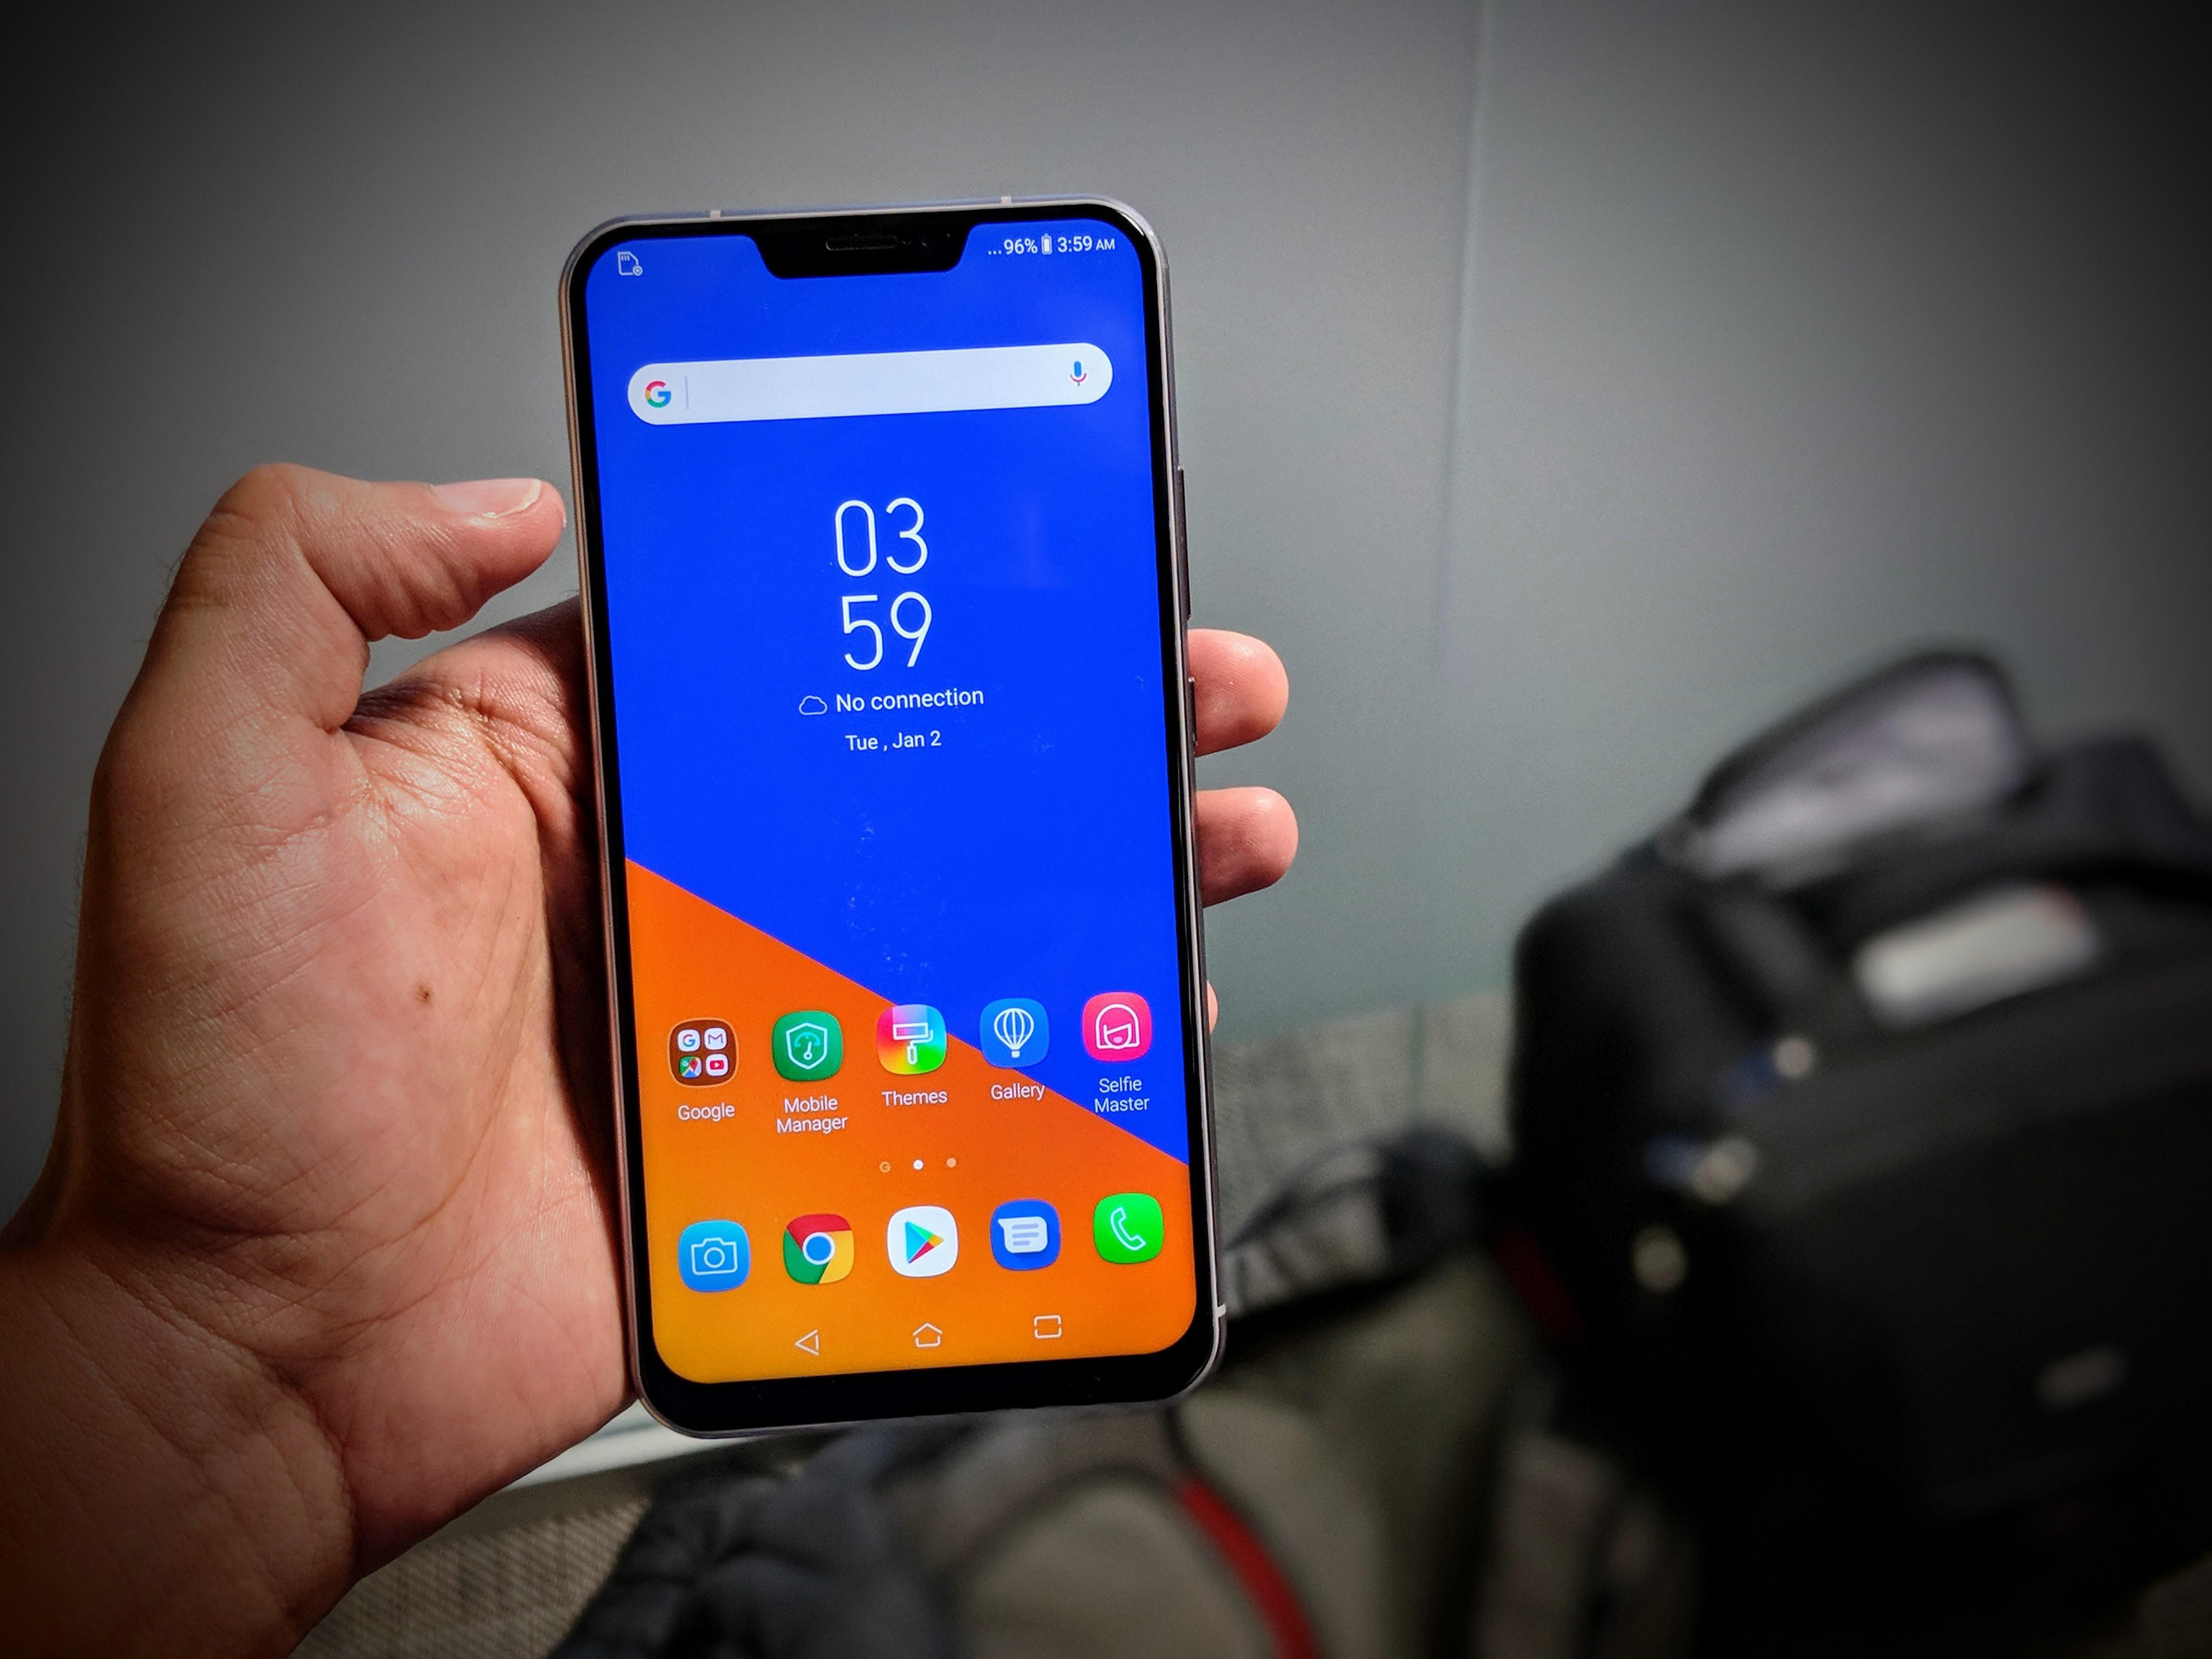 Gartner: Smartphone shipments will bounce back in 2018 - CNET